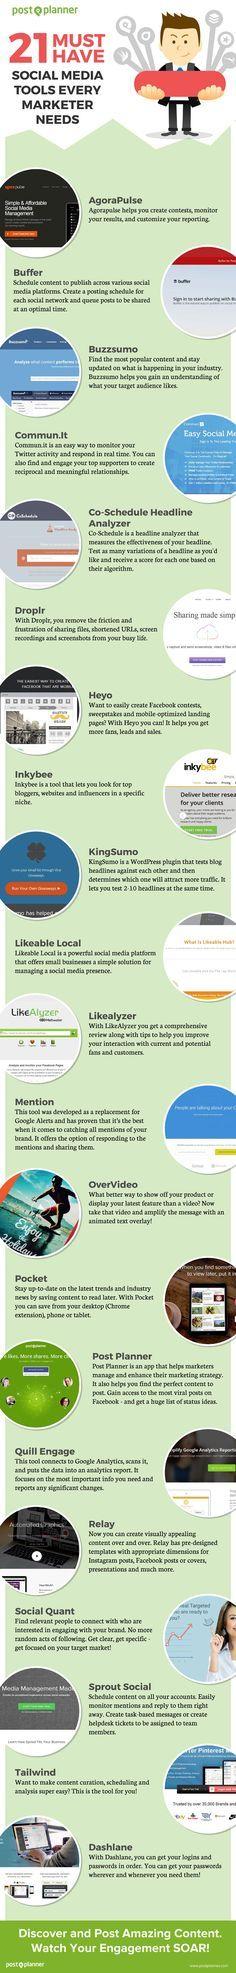 21 Social Media Tools, die man als Manager beachten sollte 21 Must Have #SocialMedia #Tools Every Marketer needs